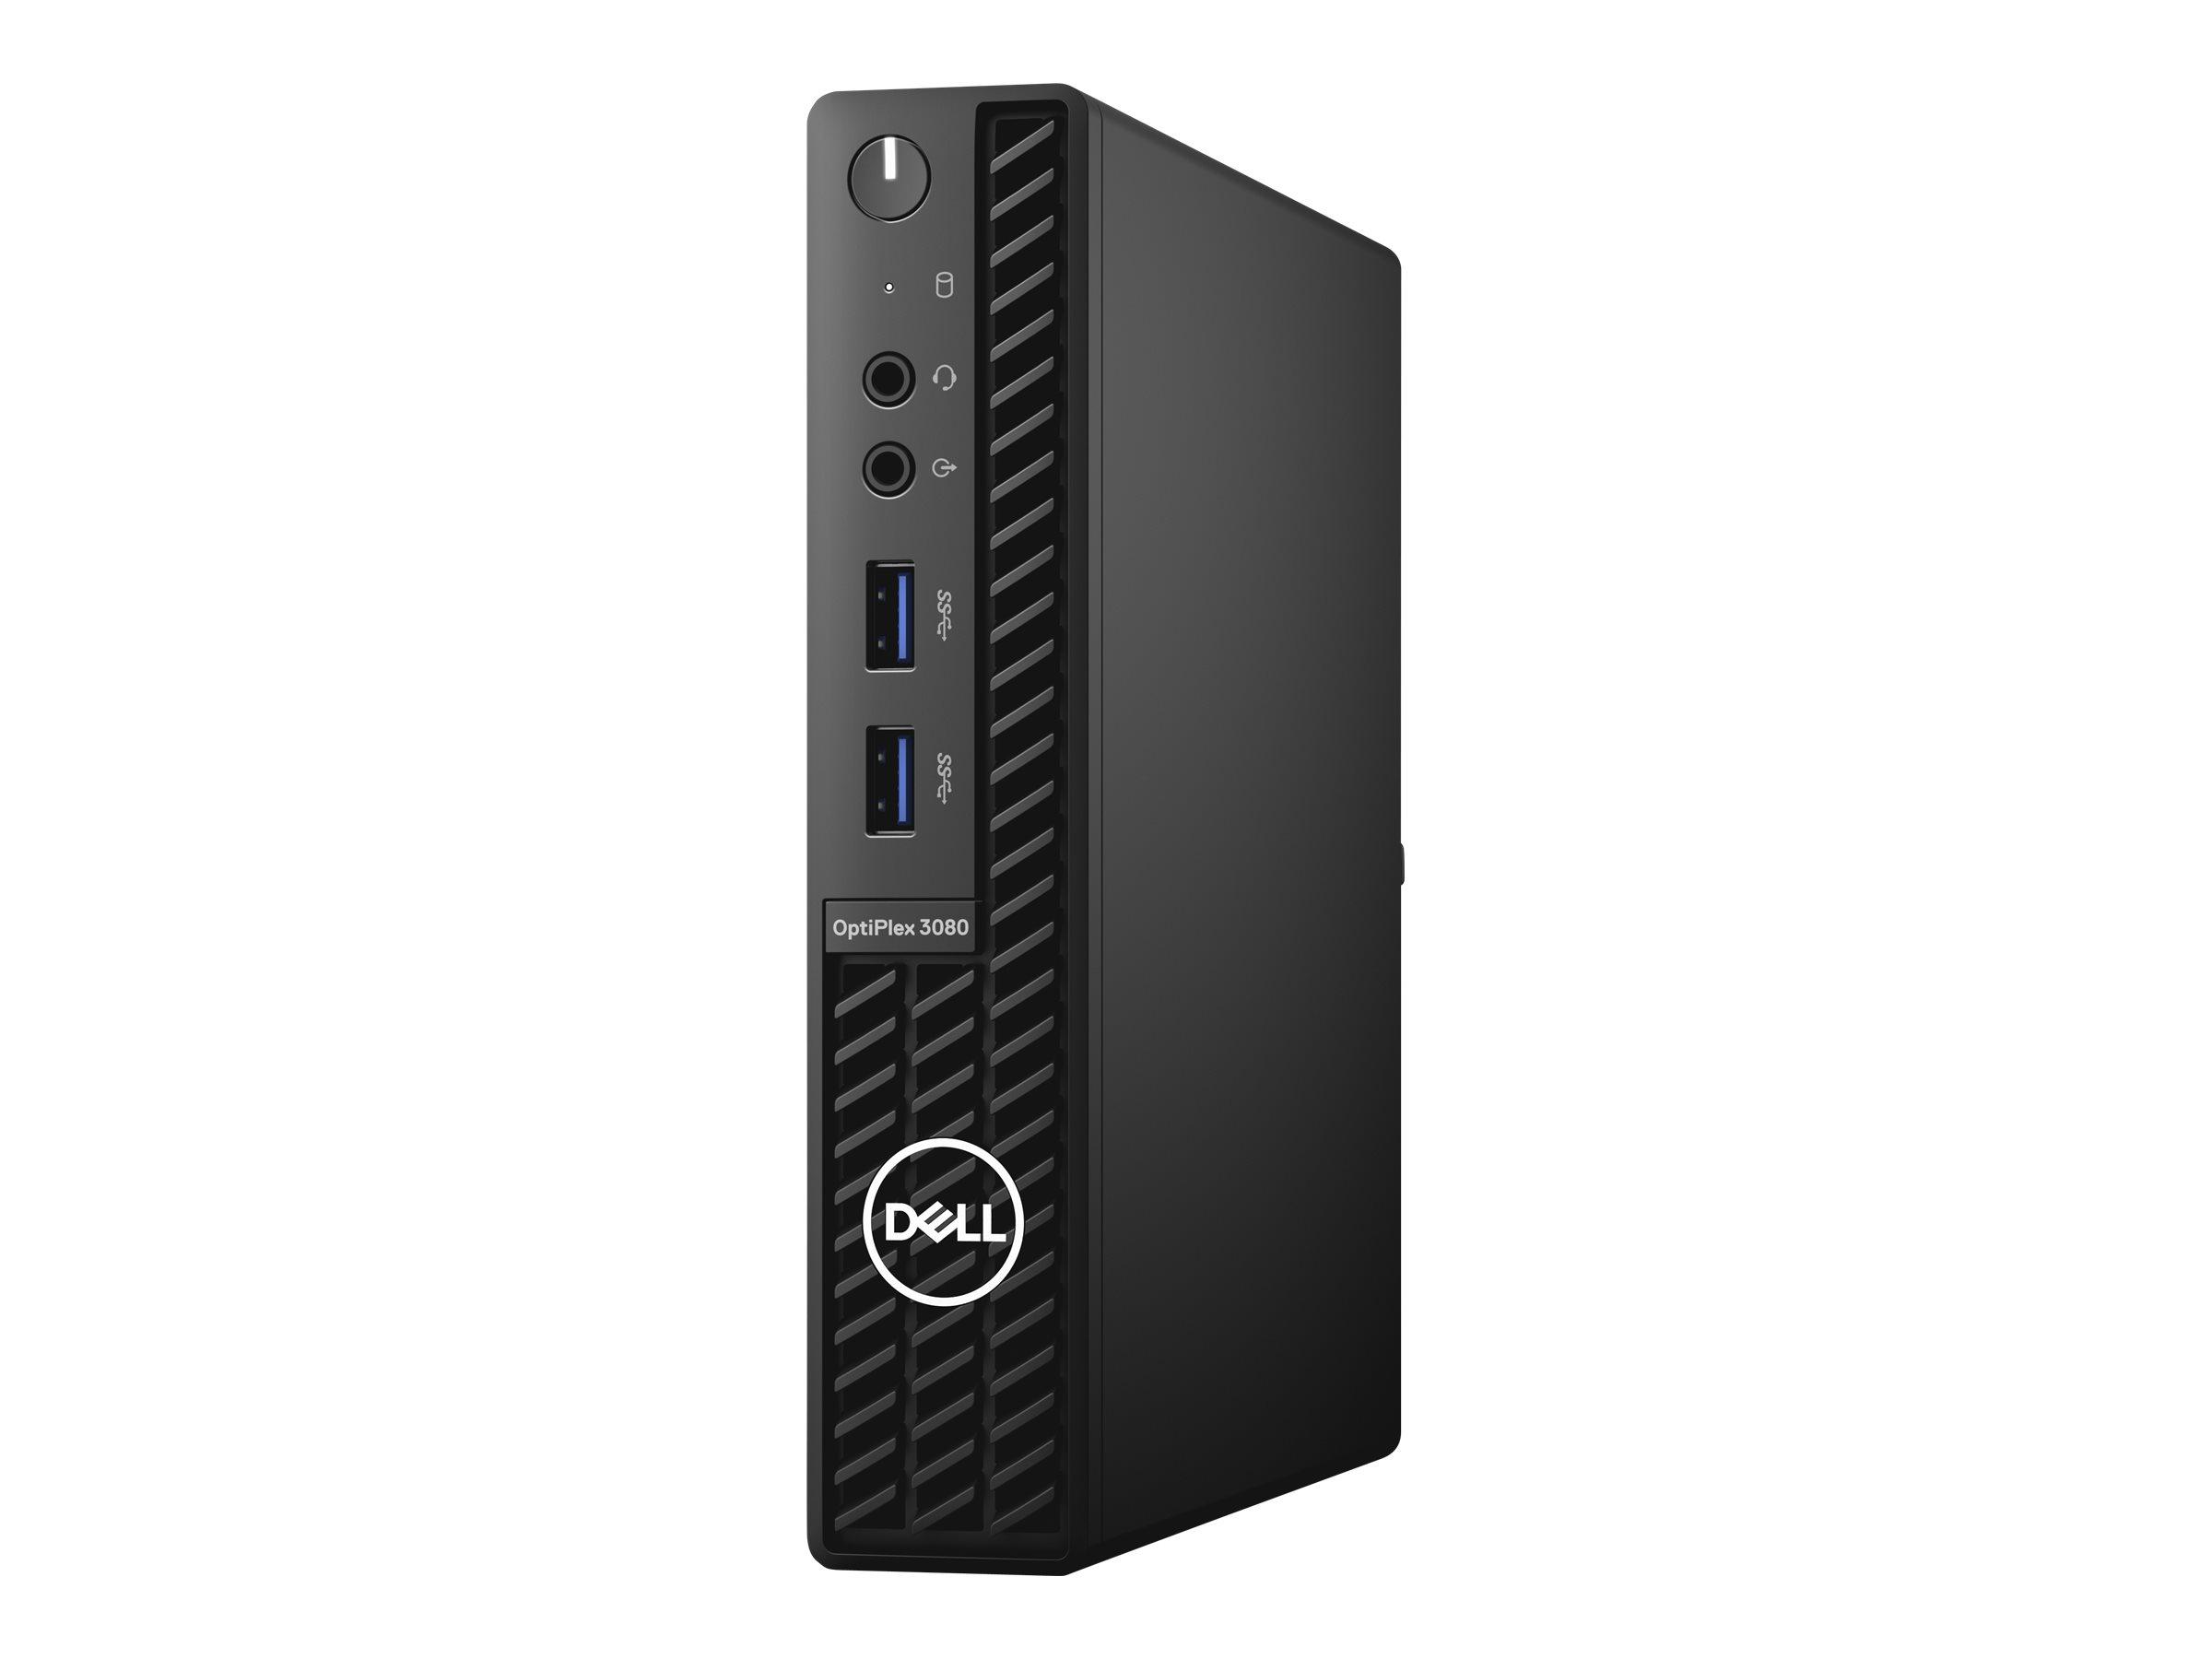 Dell OptiPlex 3080 - Micro - Core i3 10100T / 3 GHz - RAM 4 GB - SSD 128 GB - UHD Graphics 630 - GigE - WLAN: 802.11a/b/g/n/ac, Bluetooth 4.2 - Win 10 Pro 64-Bit - Monitor: keiner - BTS - mit 1 Year Basic Onsite (AT, DE - 3 Years)